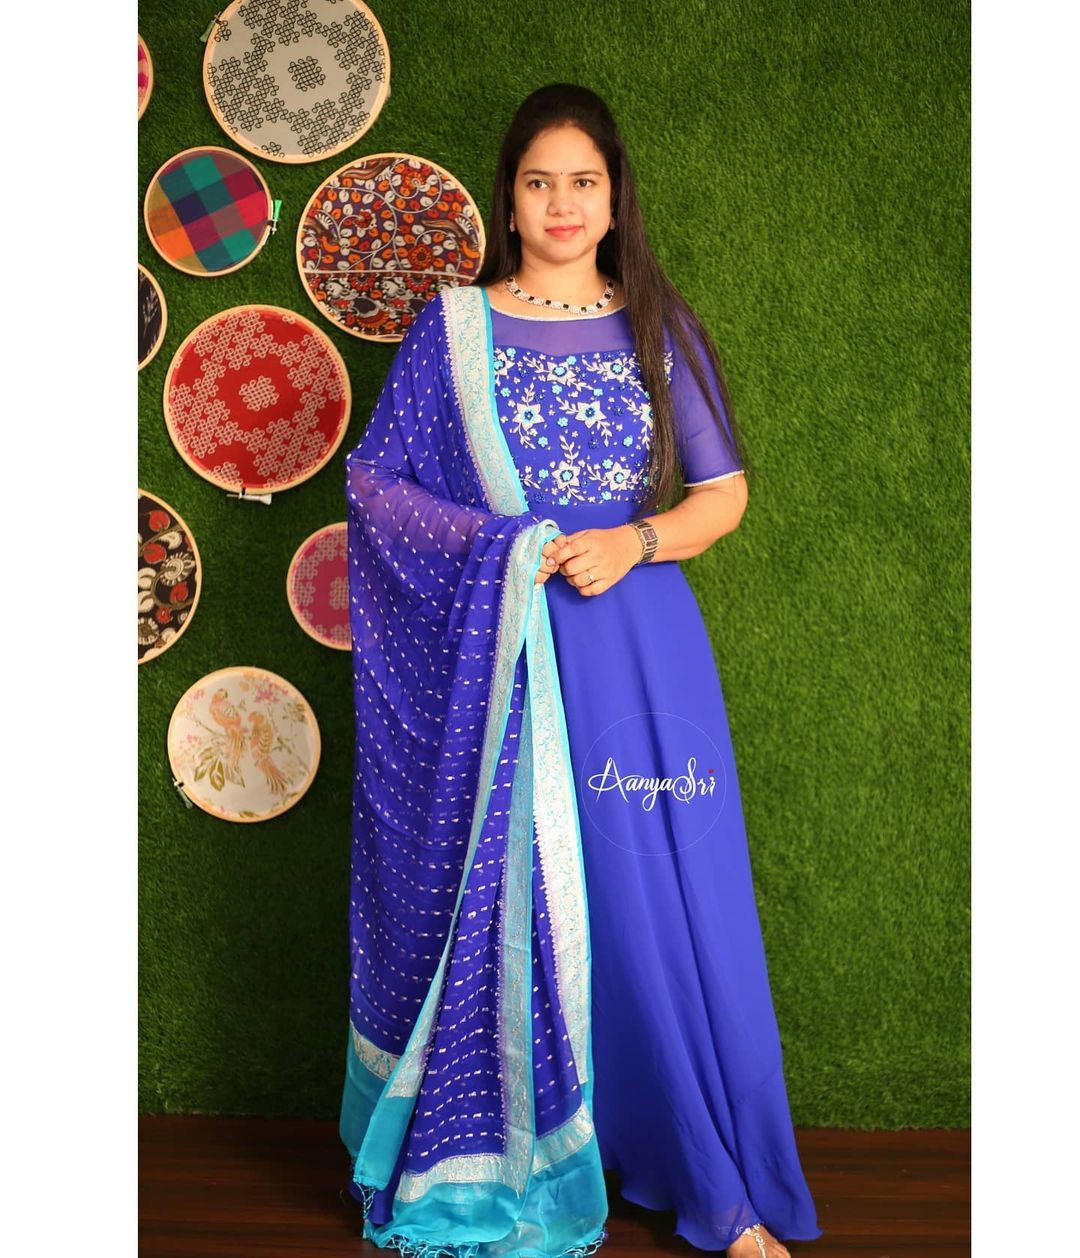 Neelamani. Price : RS. 6800/- Royal blue intricate hand worked long frock with pure chiffon banaras khaddi dupatta with a sheer yoke. 2021-05-03